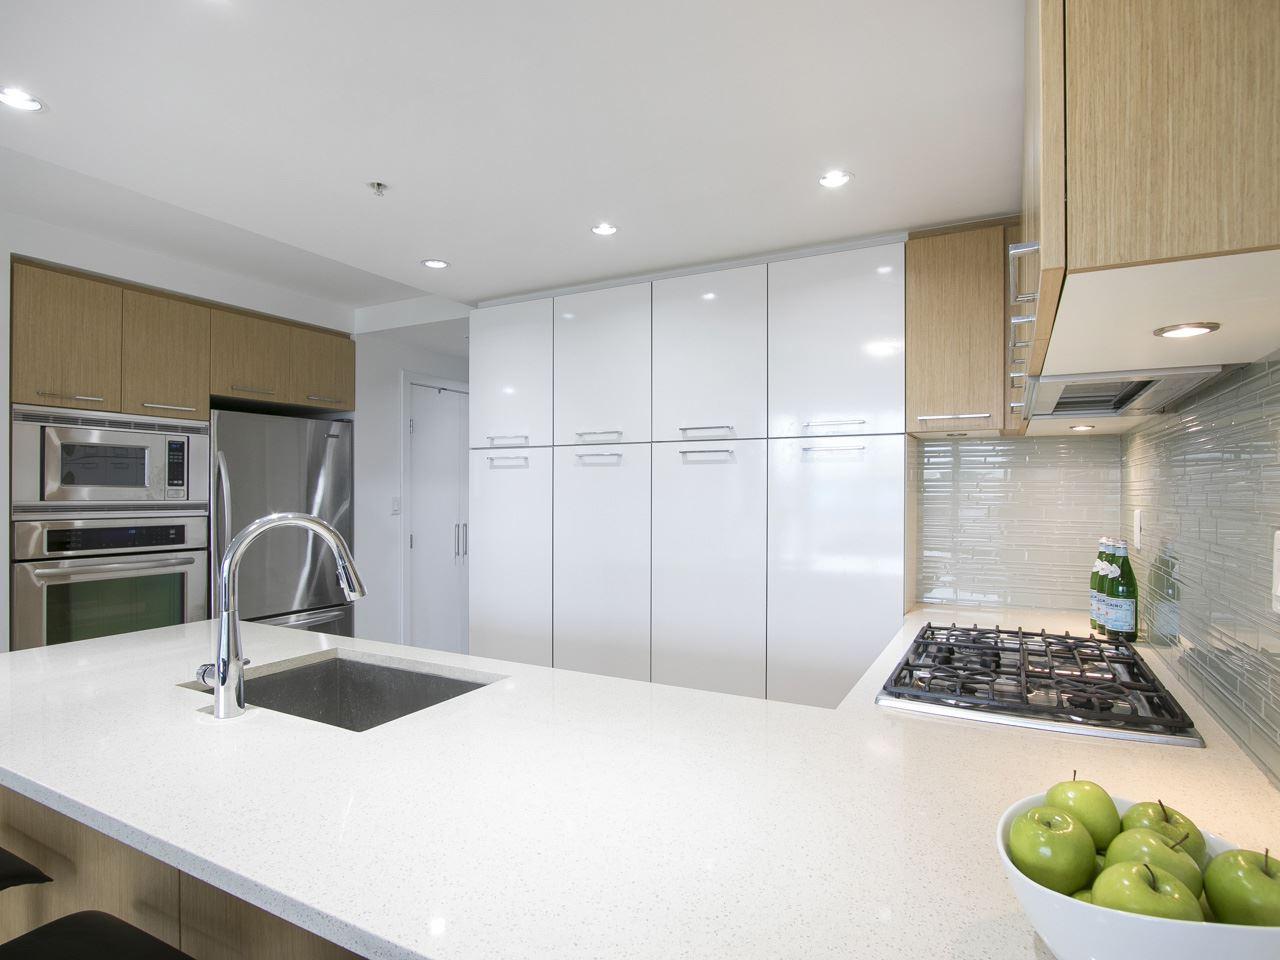 Condo Apartment at 310 1680 W 4TH AVENUE, Unit 310, Vancouver West, British Columbia. Image 11